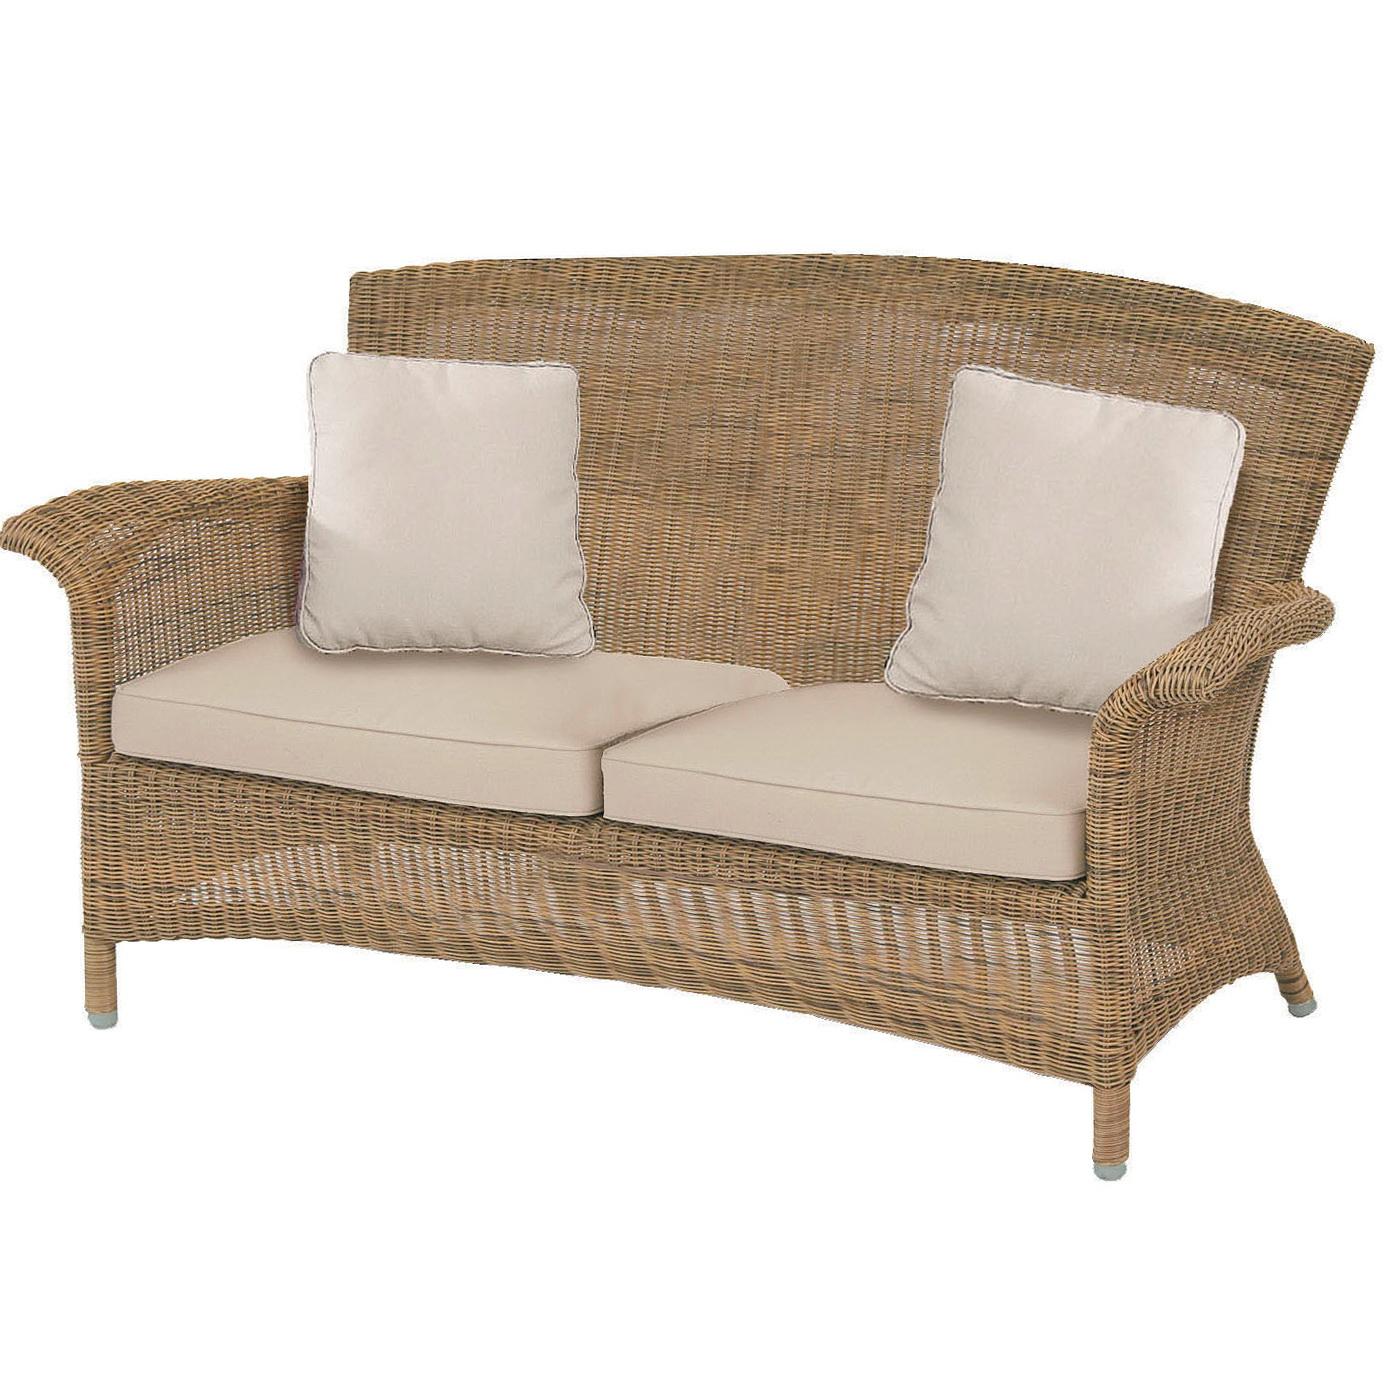 Foam For Sofa Cushions Ireland Home Design Ideas